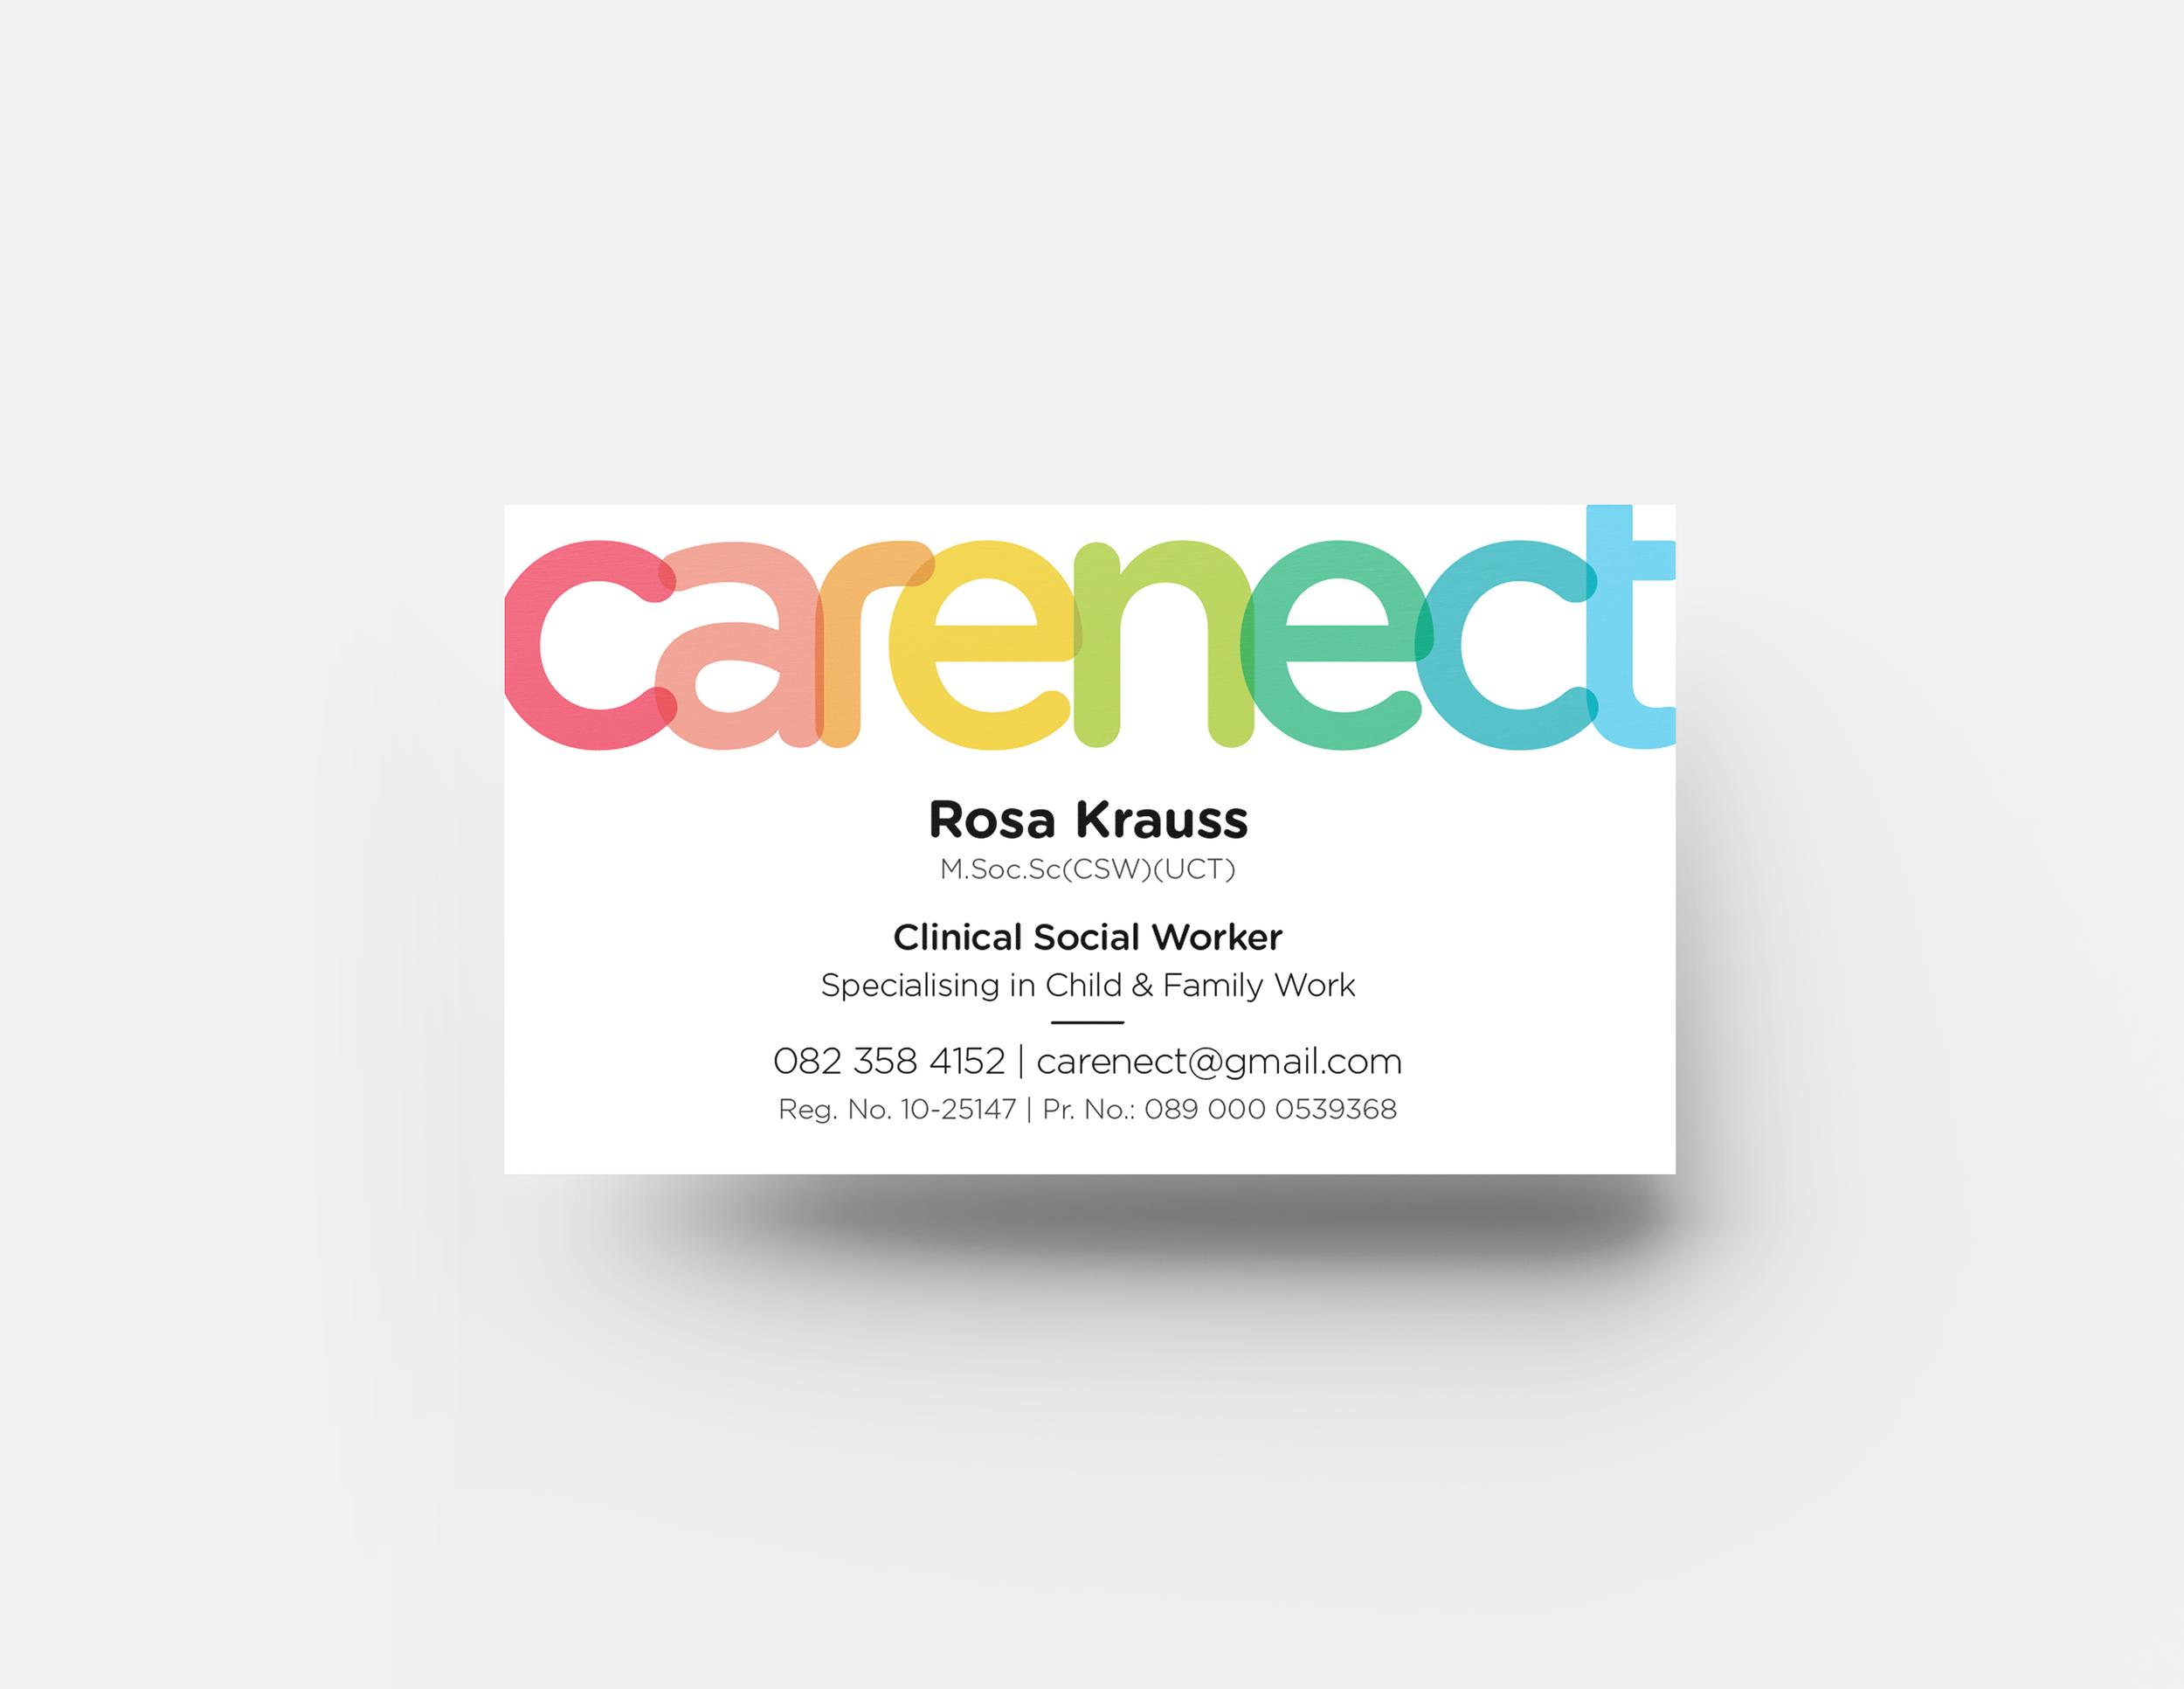 Talia-OBrien-Carenect-business-card.png